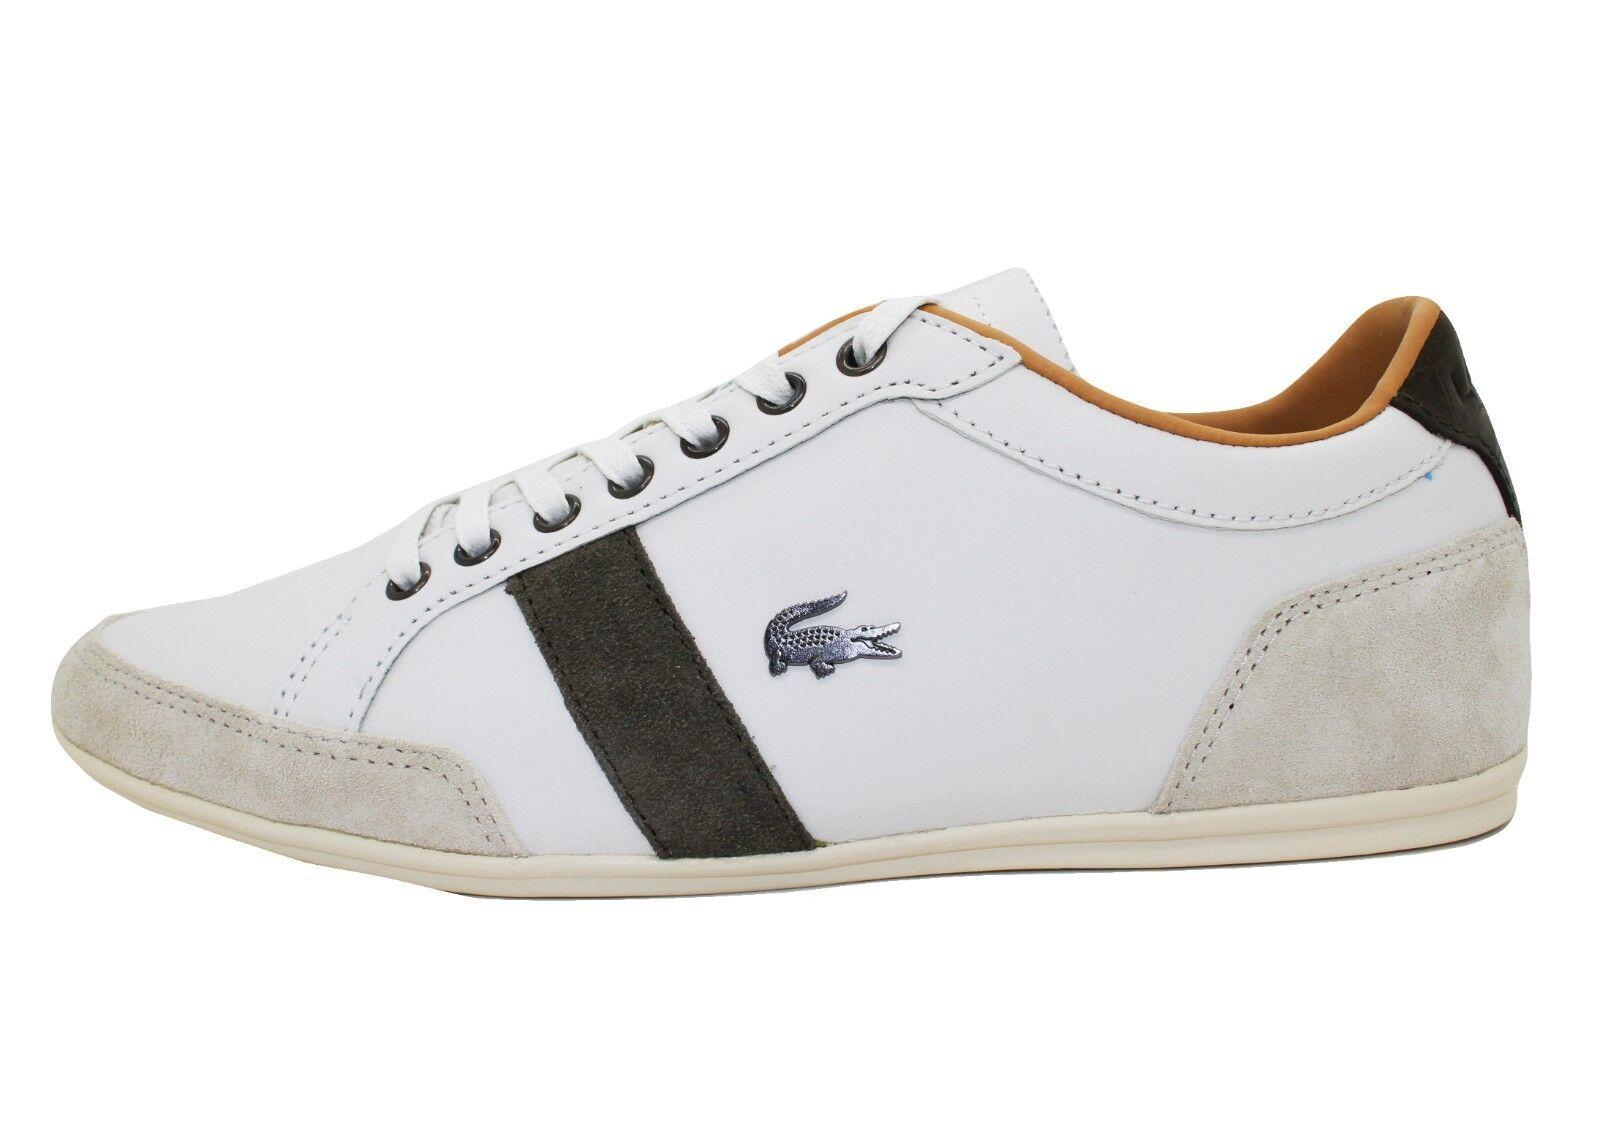 Lacoste schuhe Mens ALISOS 19 Fashion Turnschuhe Casual Leather Weiß braun